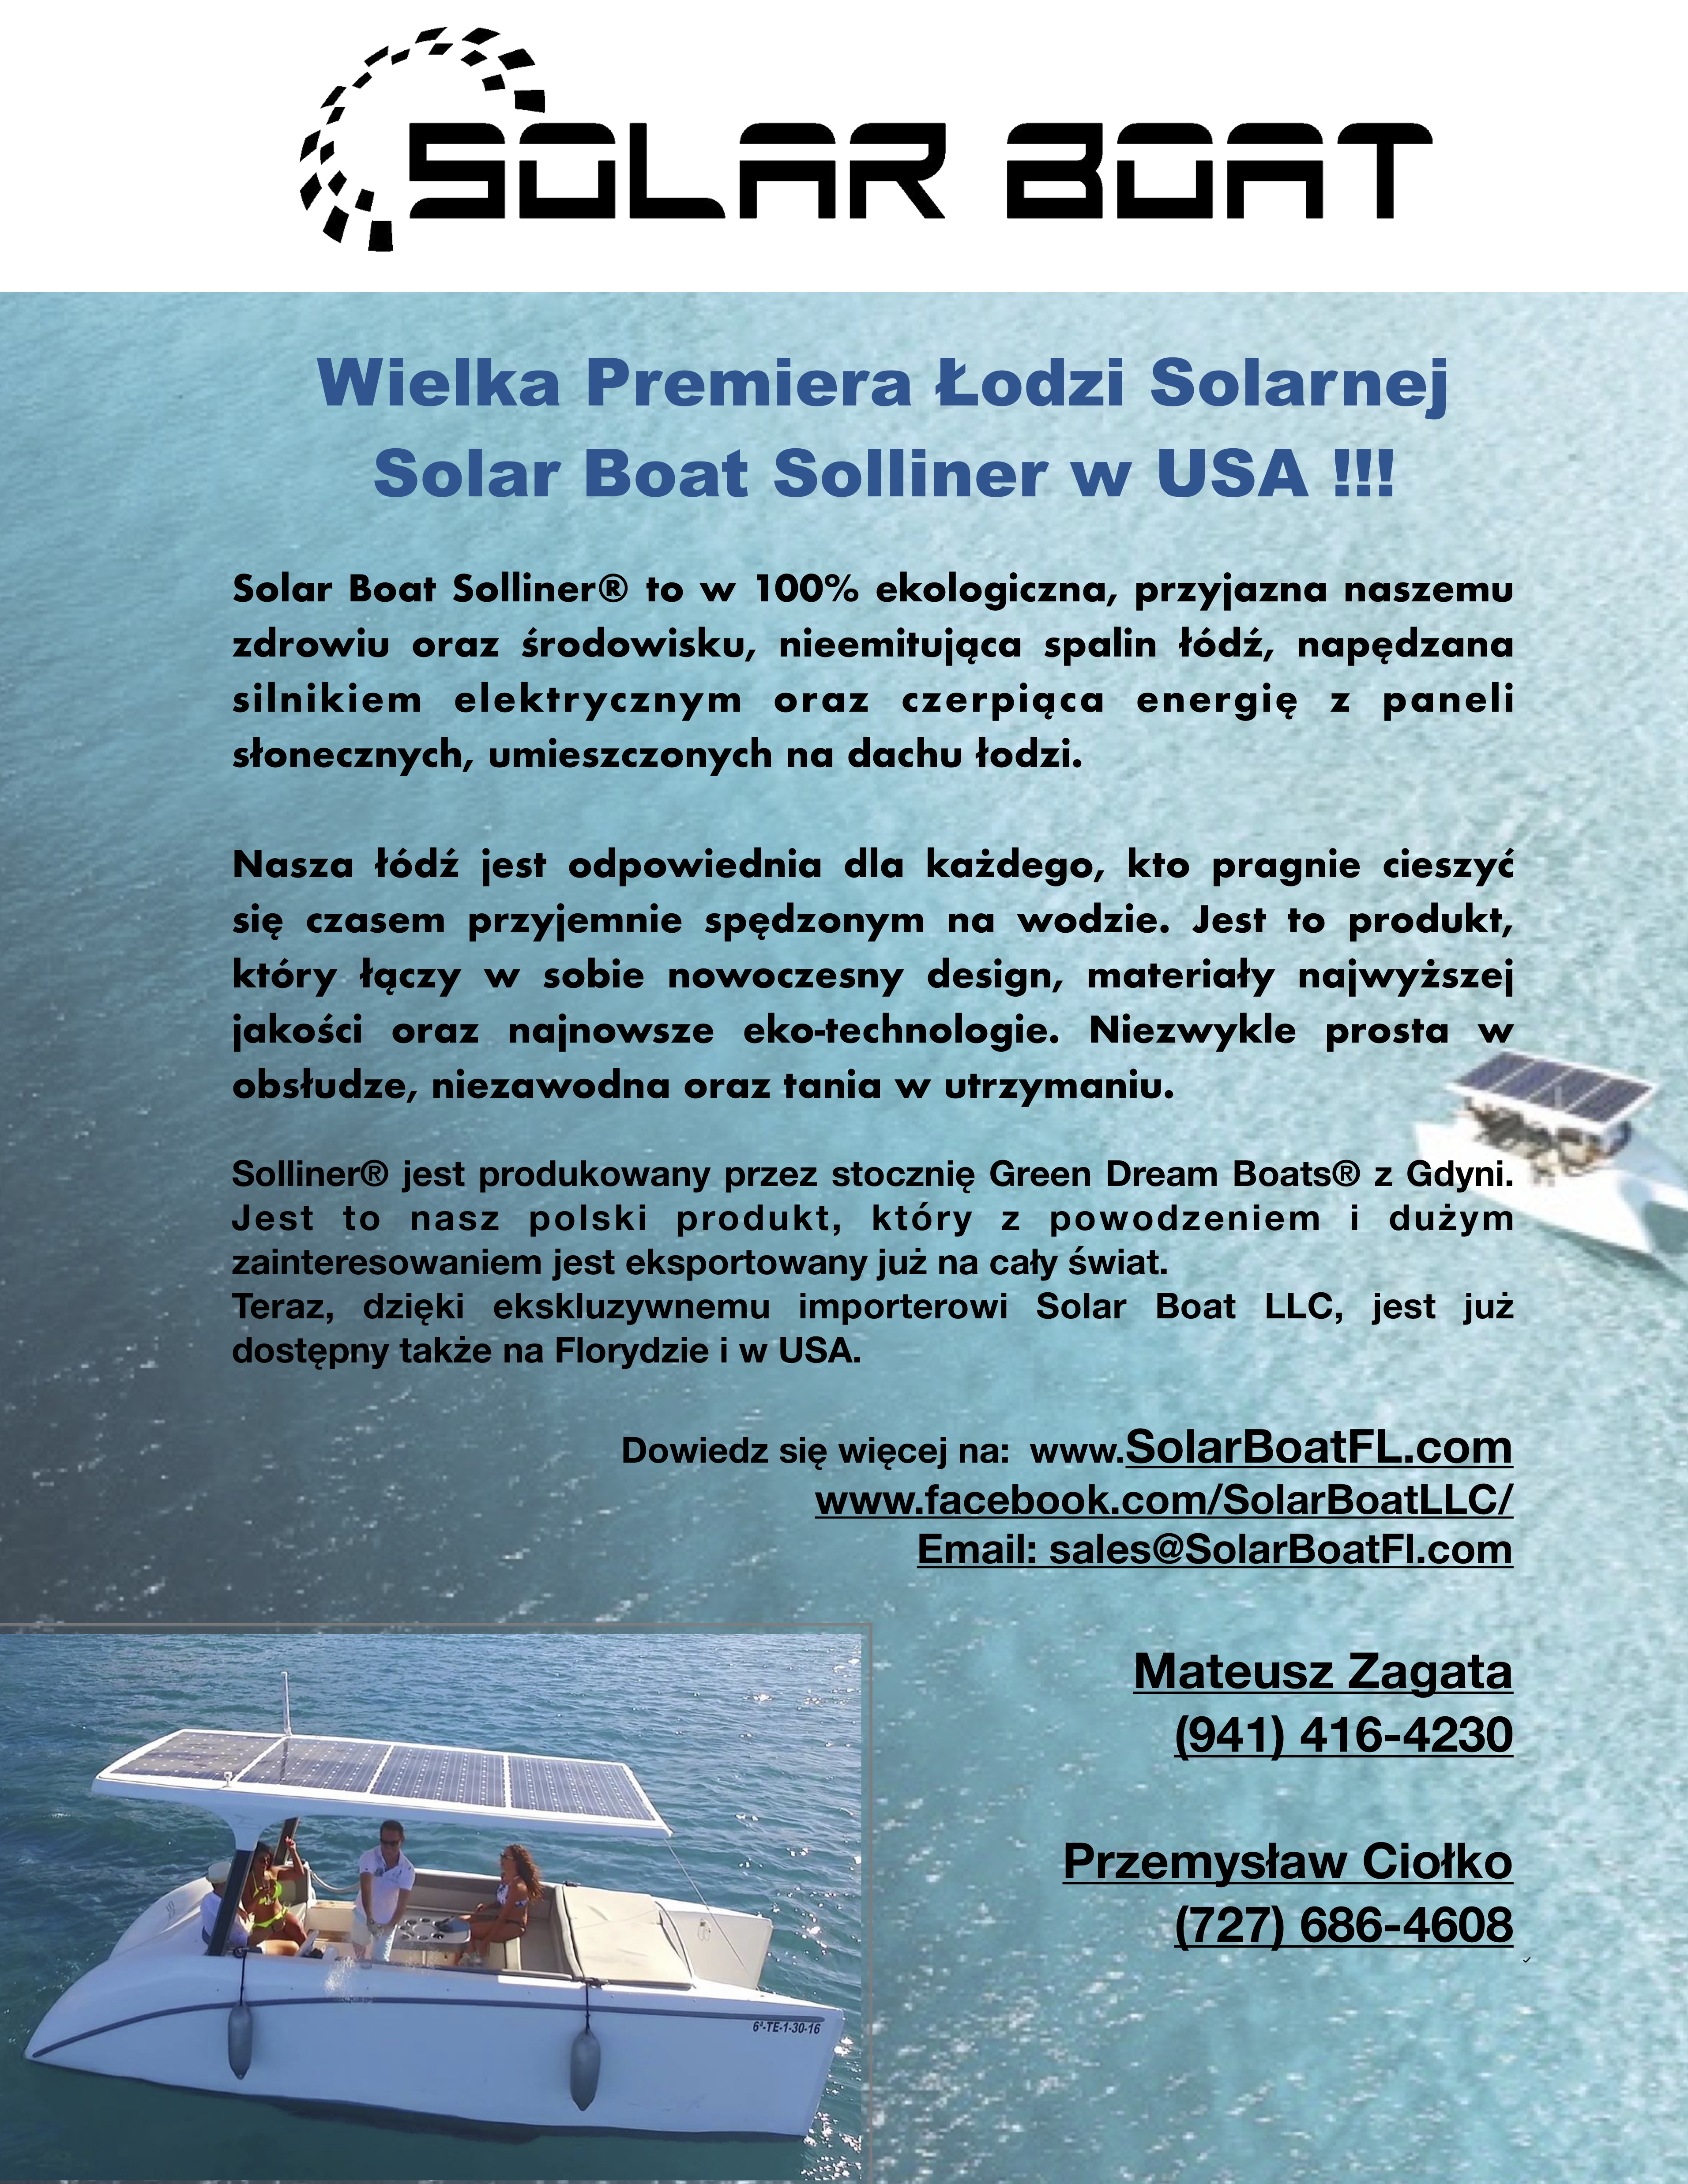 Polonian Echo Solar Boat